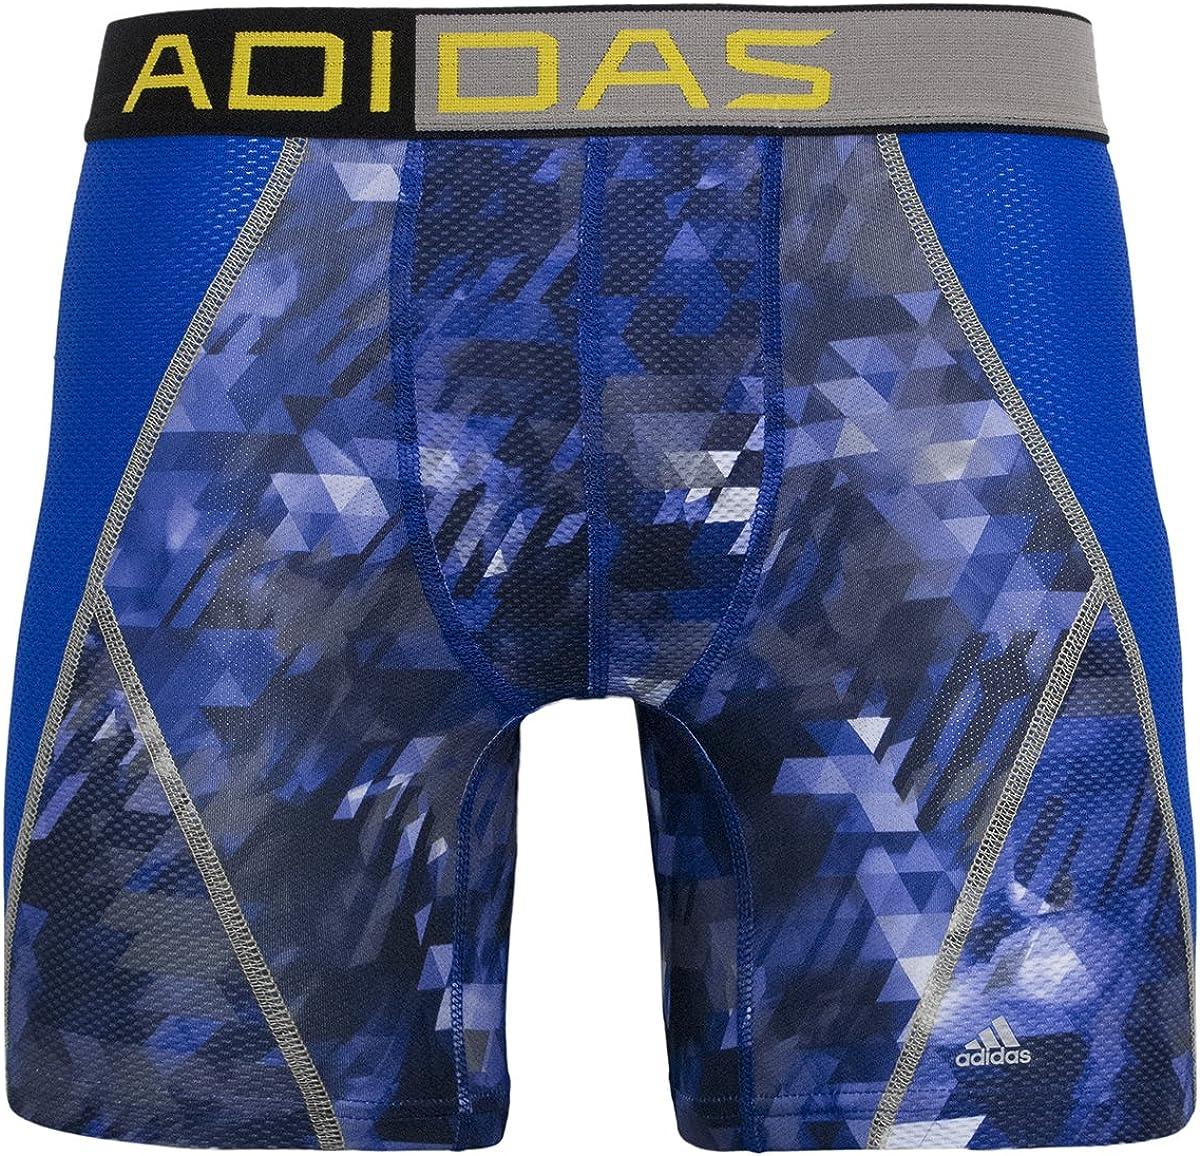 adidas Men's Climacool Mesh Boxer Brief Underwear